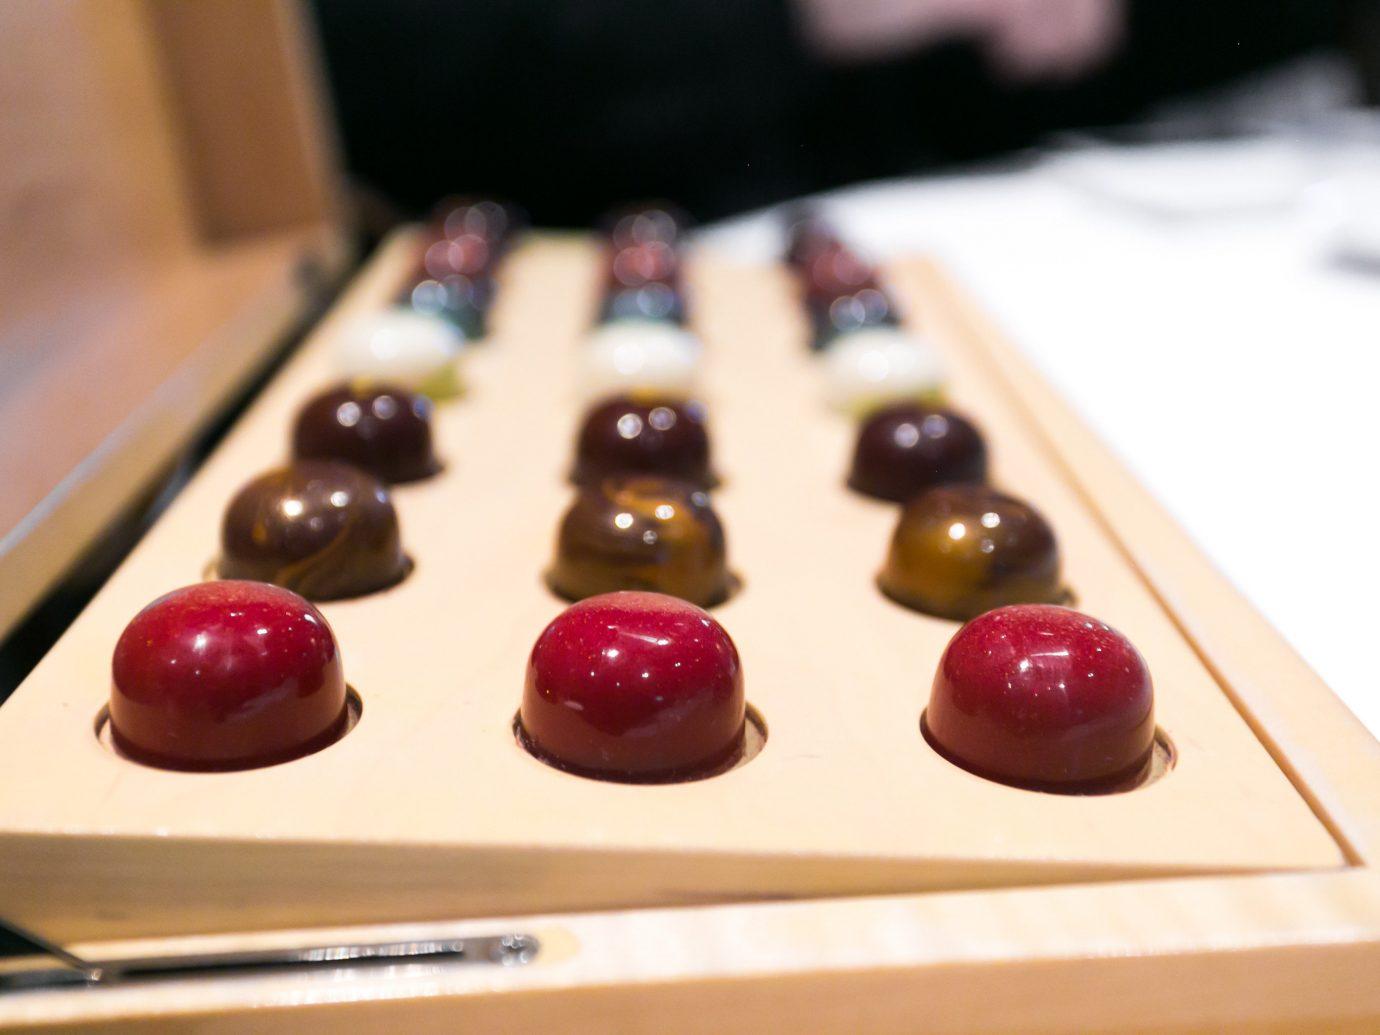 Food + Drink indoor food dessert chocolate praline produce cake baking cuisine petit four sweetness fruit meal